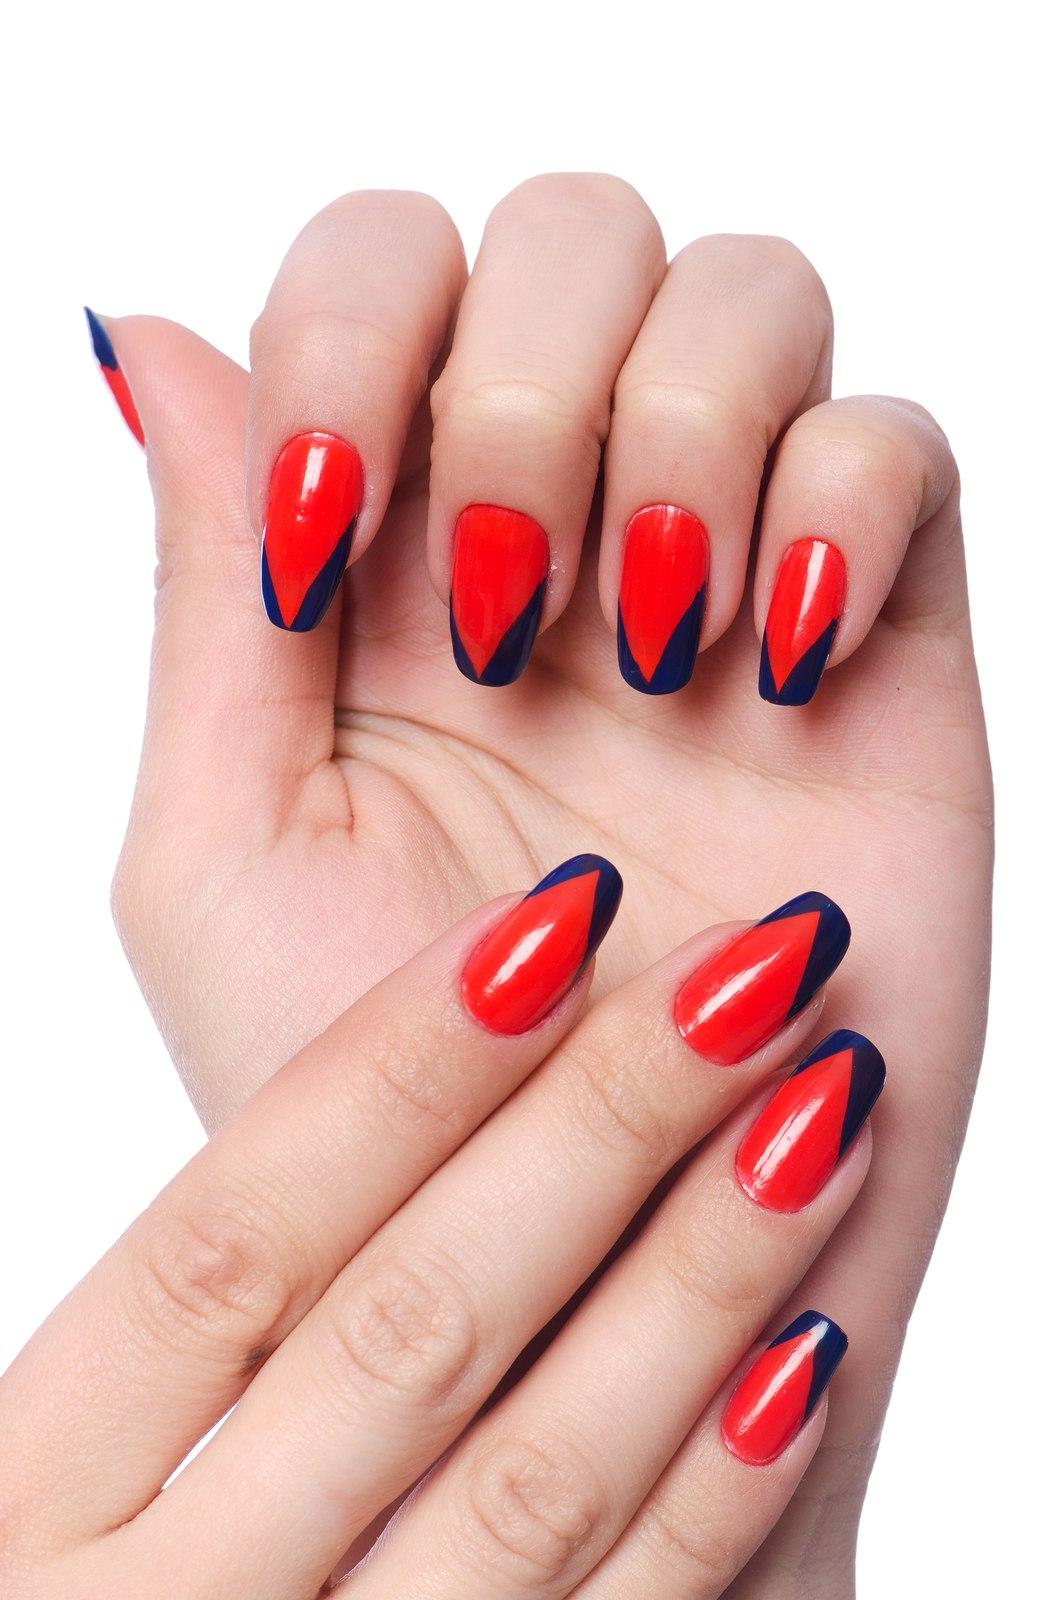 Nail Services | Manicures, Pedicures, Shellac | Flaunt ...